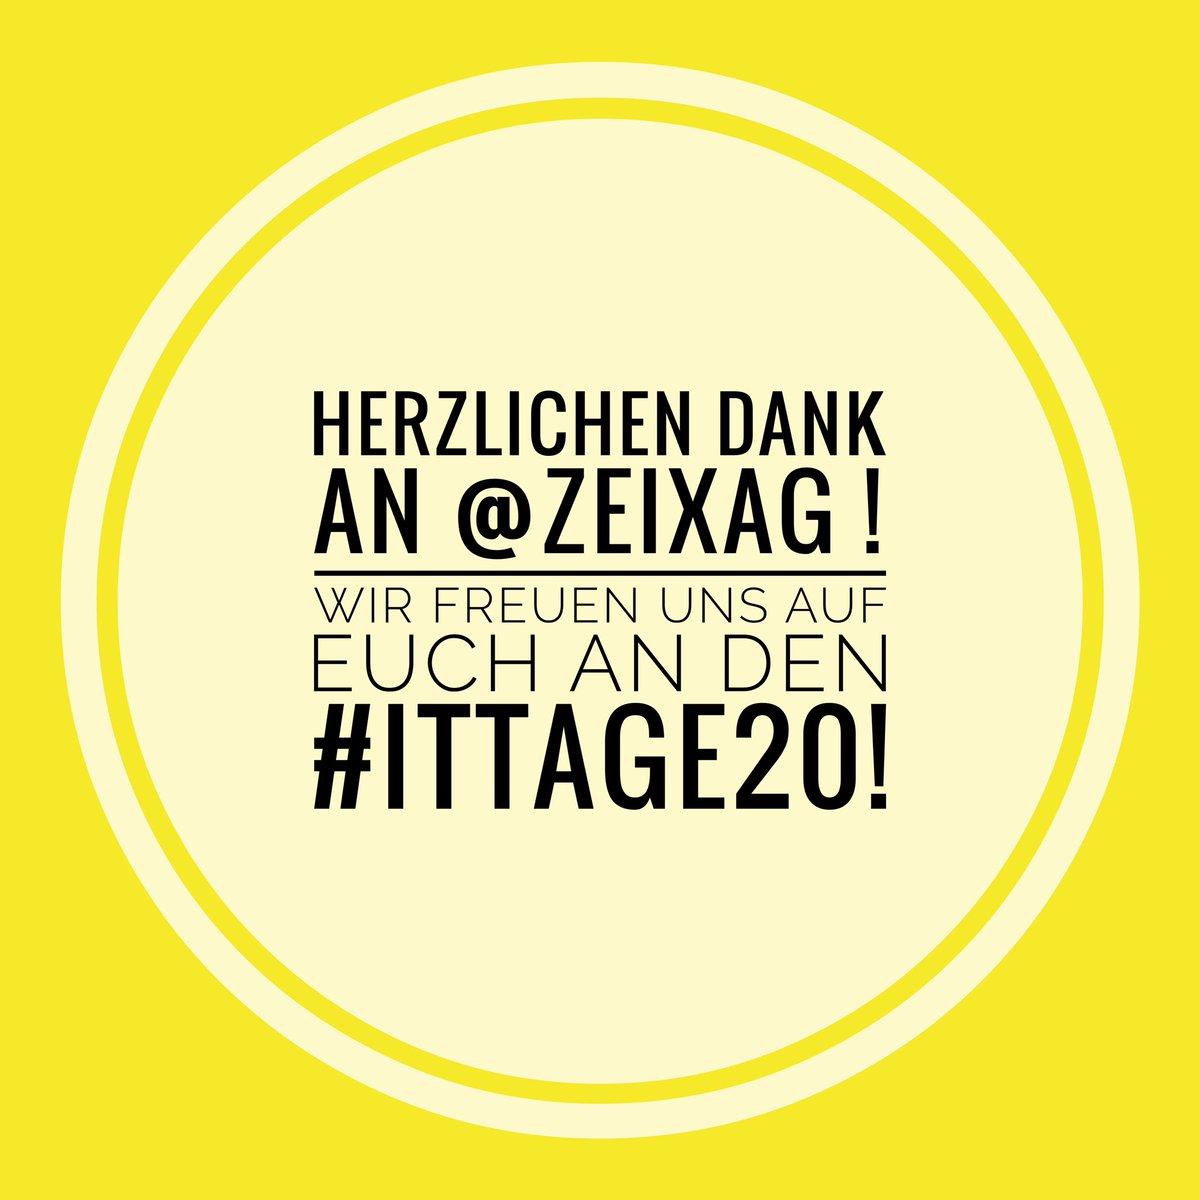 Wir freuen uns auf @zeix an den #ITTage20 pic.twitter.com/mpWA9g0w16